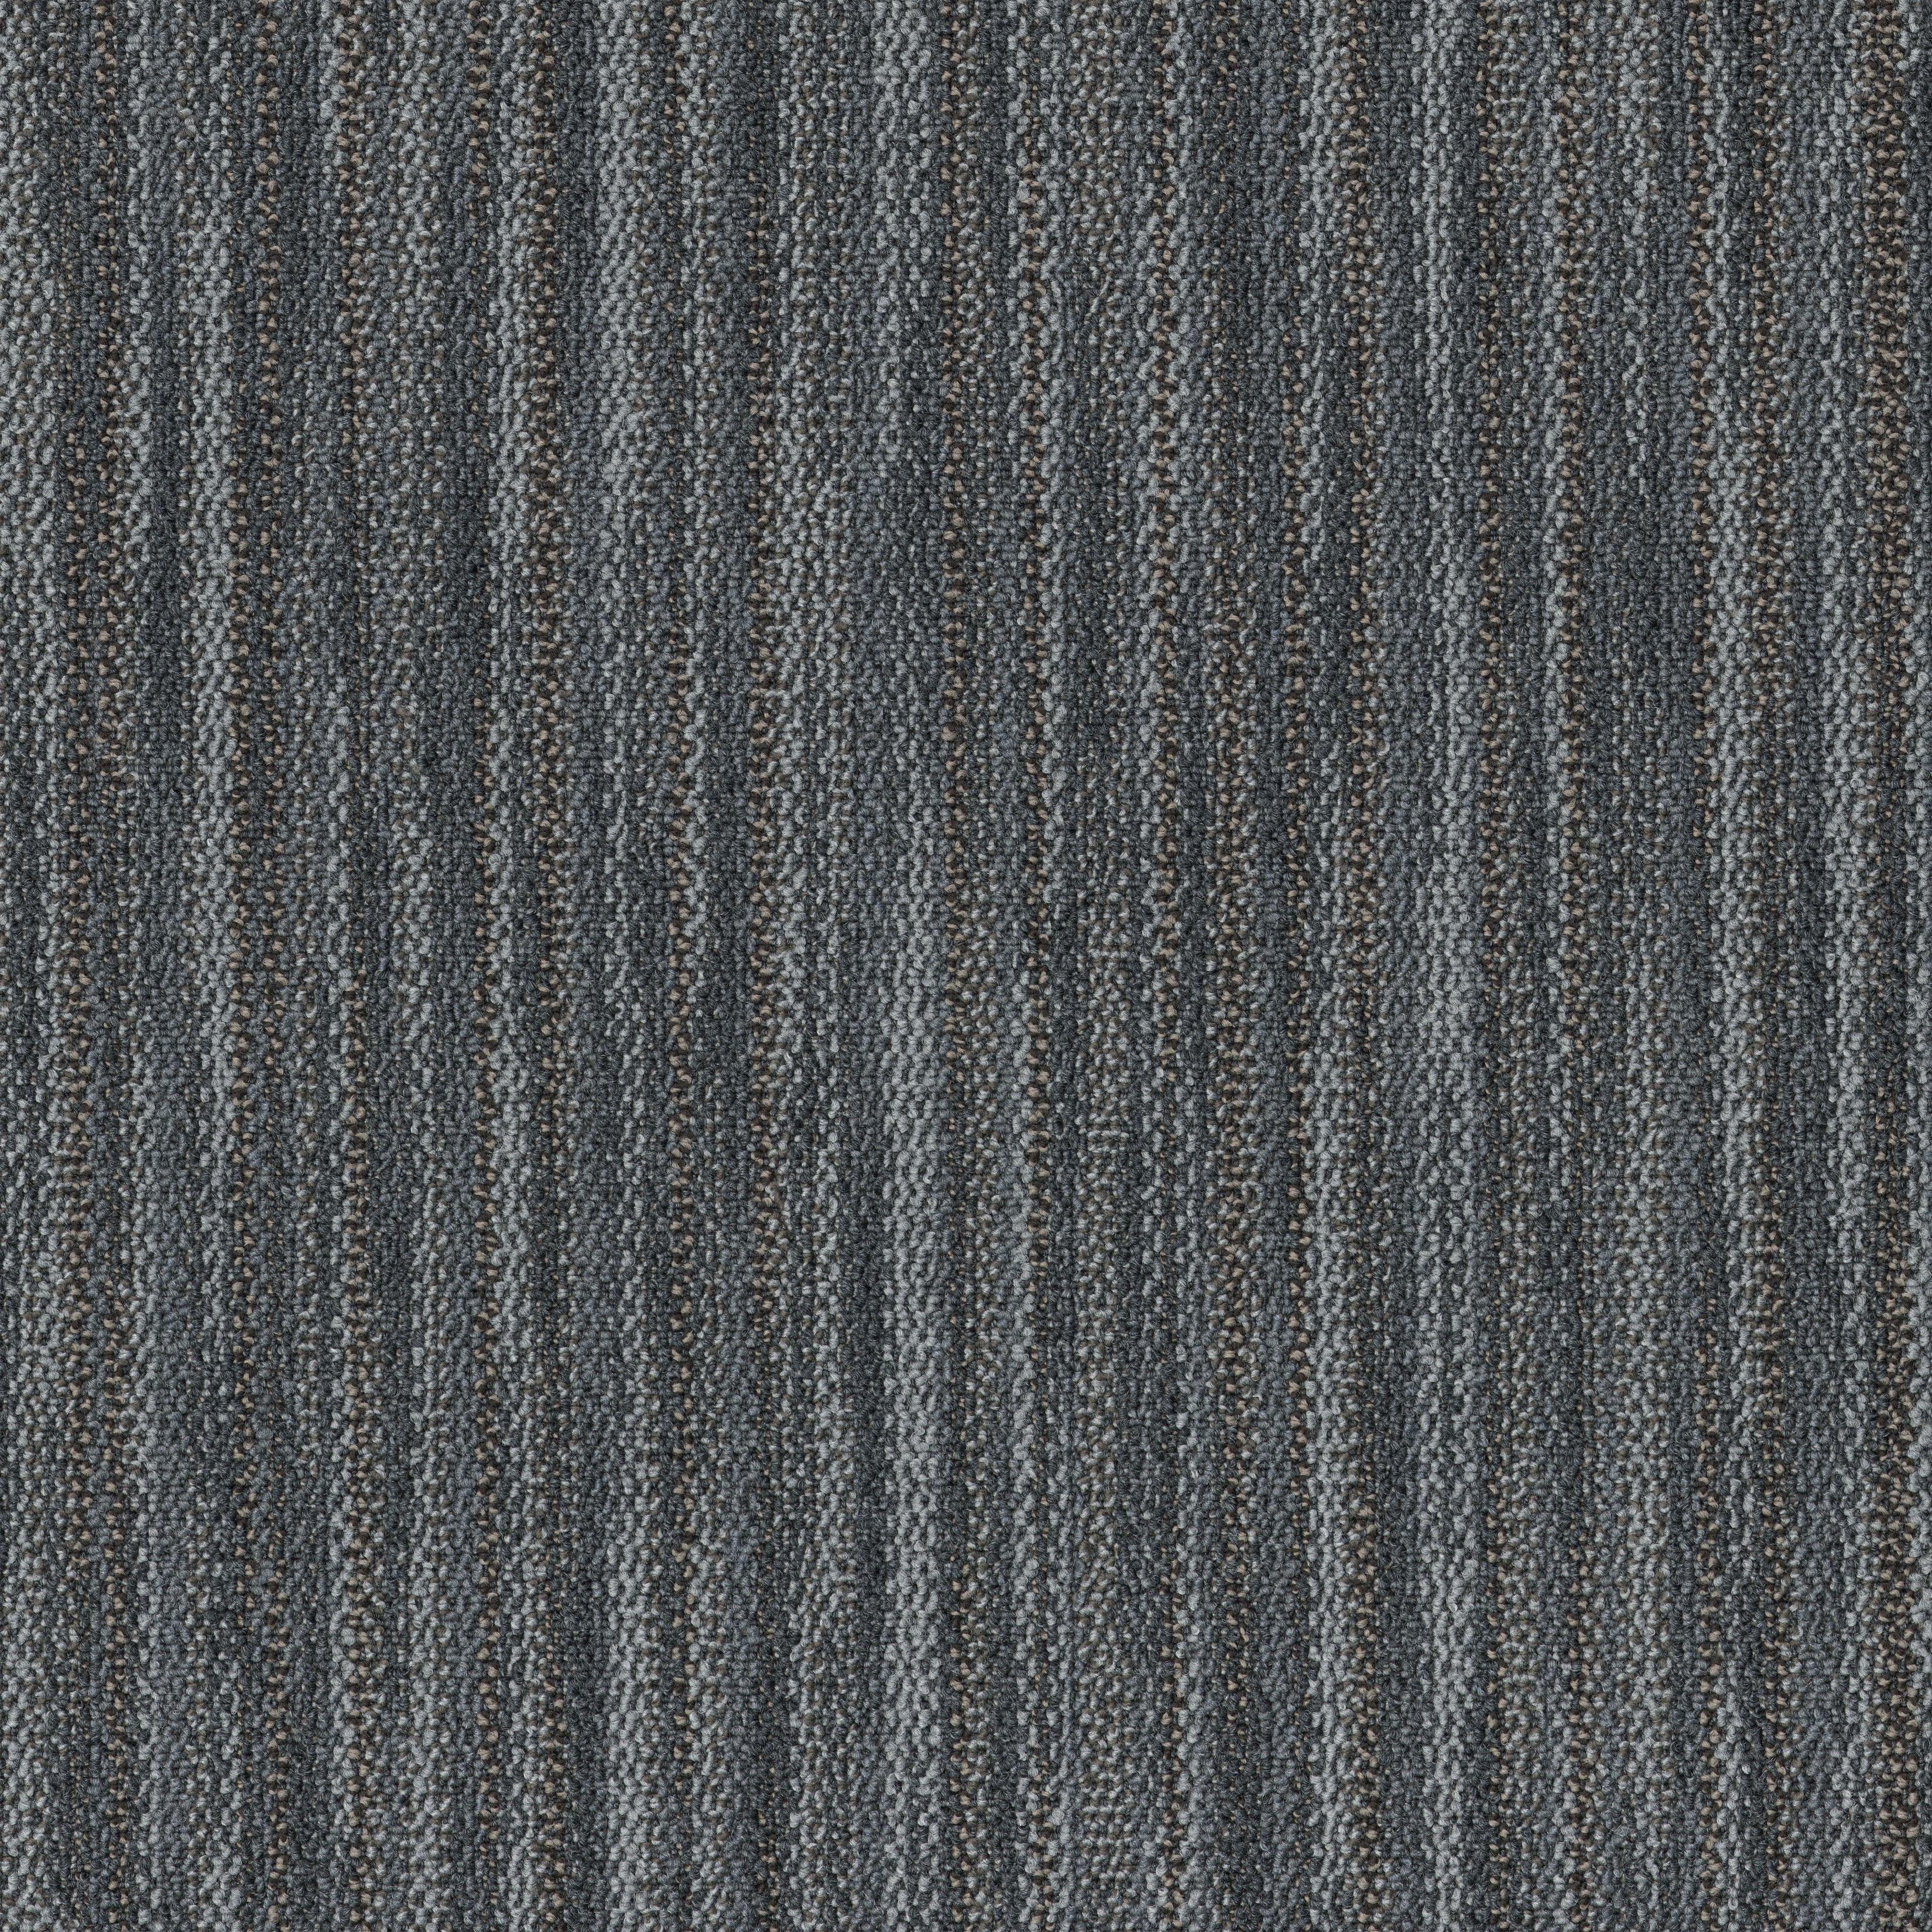 "Shaw Companion Carpet Tile Equal 24"" x 24"" Premium(80 sq ft/ctn)"